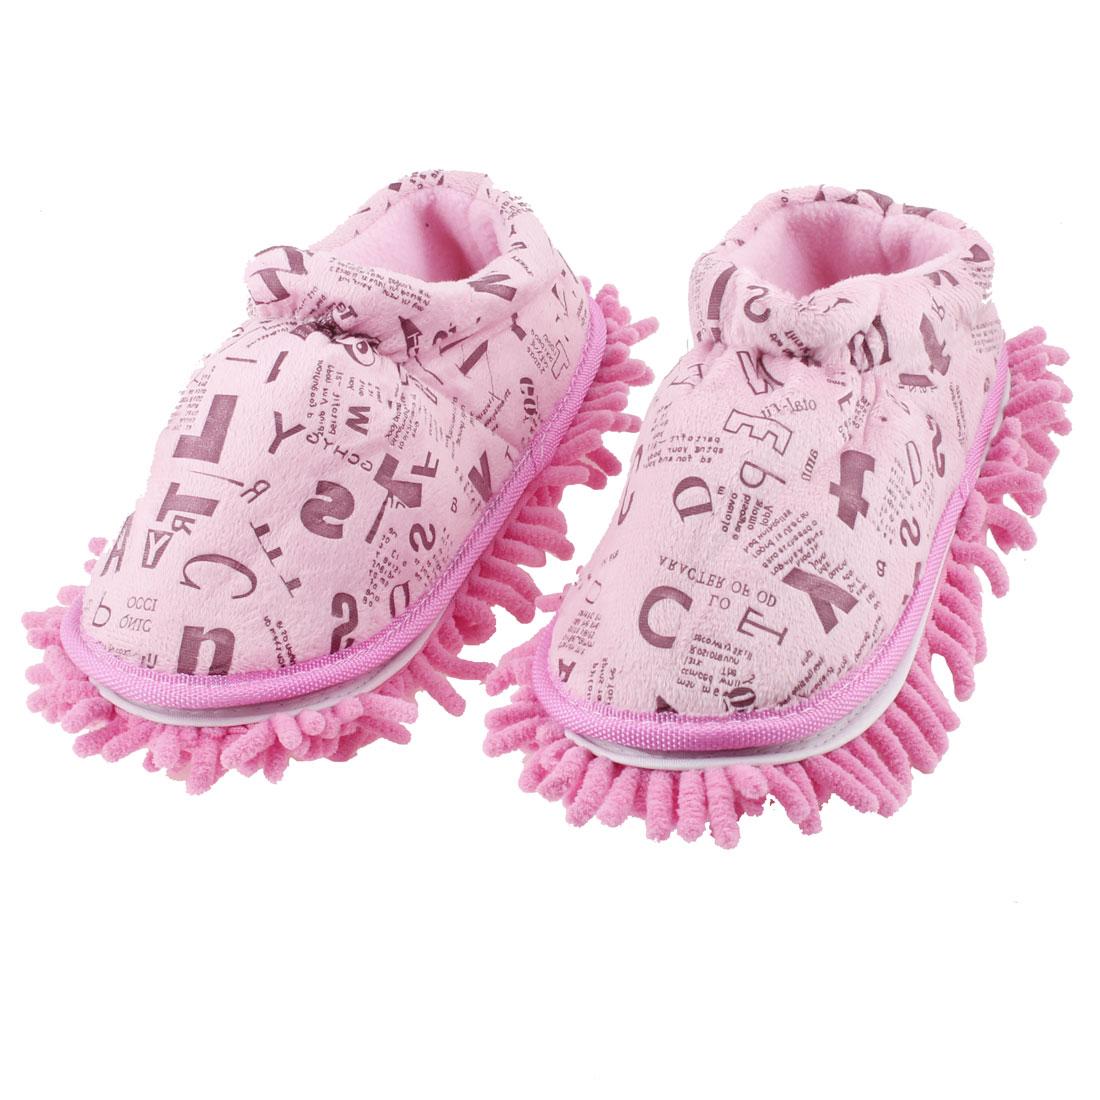 Pair Letter Print Microfiber Dust Floor Clean Winter Mop Slippers Shoes Pink